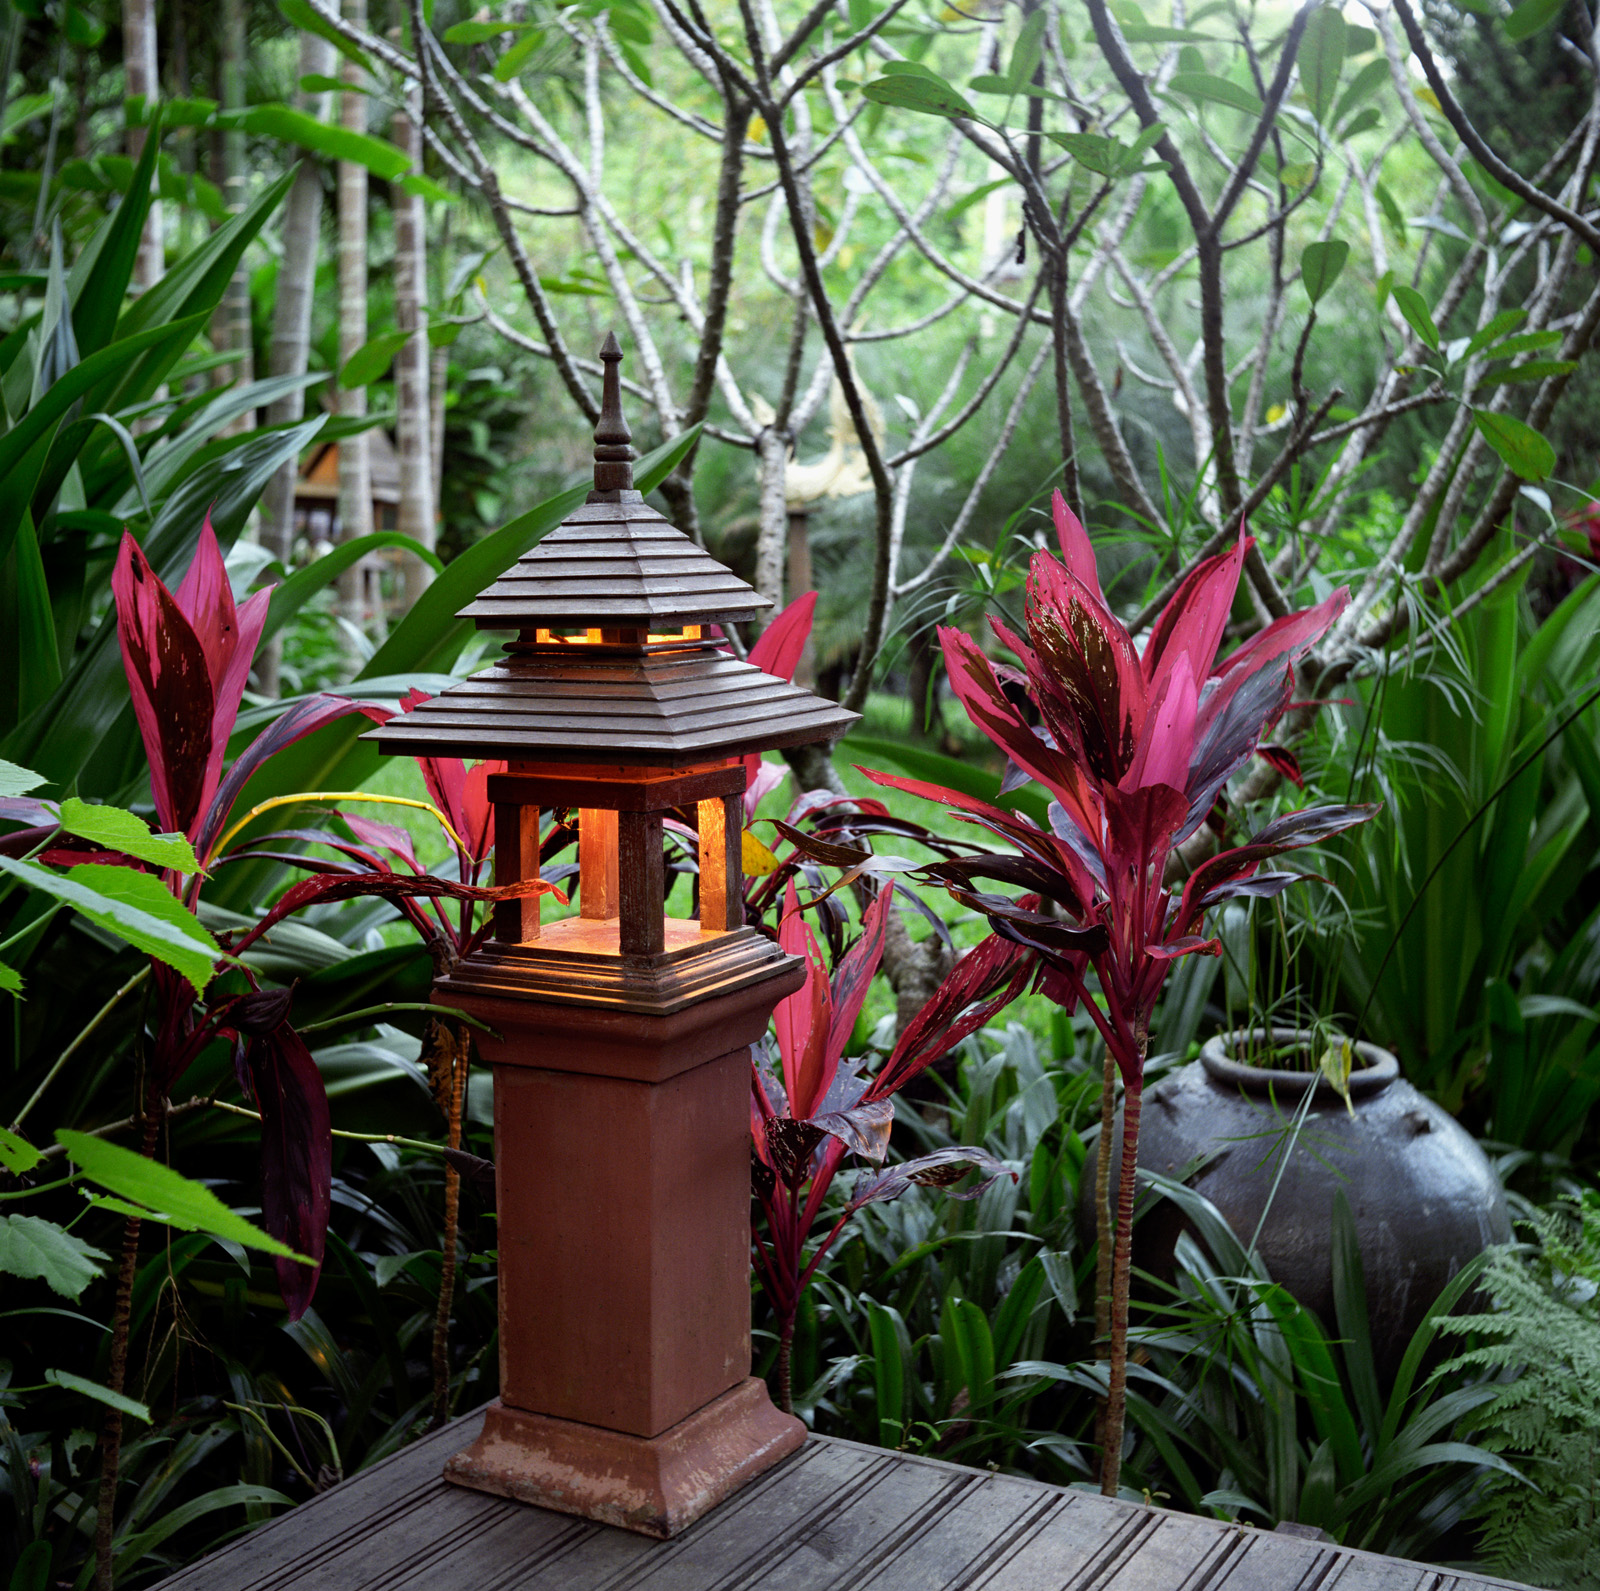 Sukantara Cascade Resort, Chiang Mai, Thailand